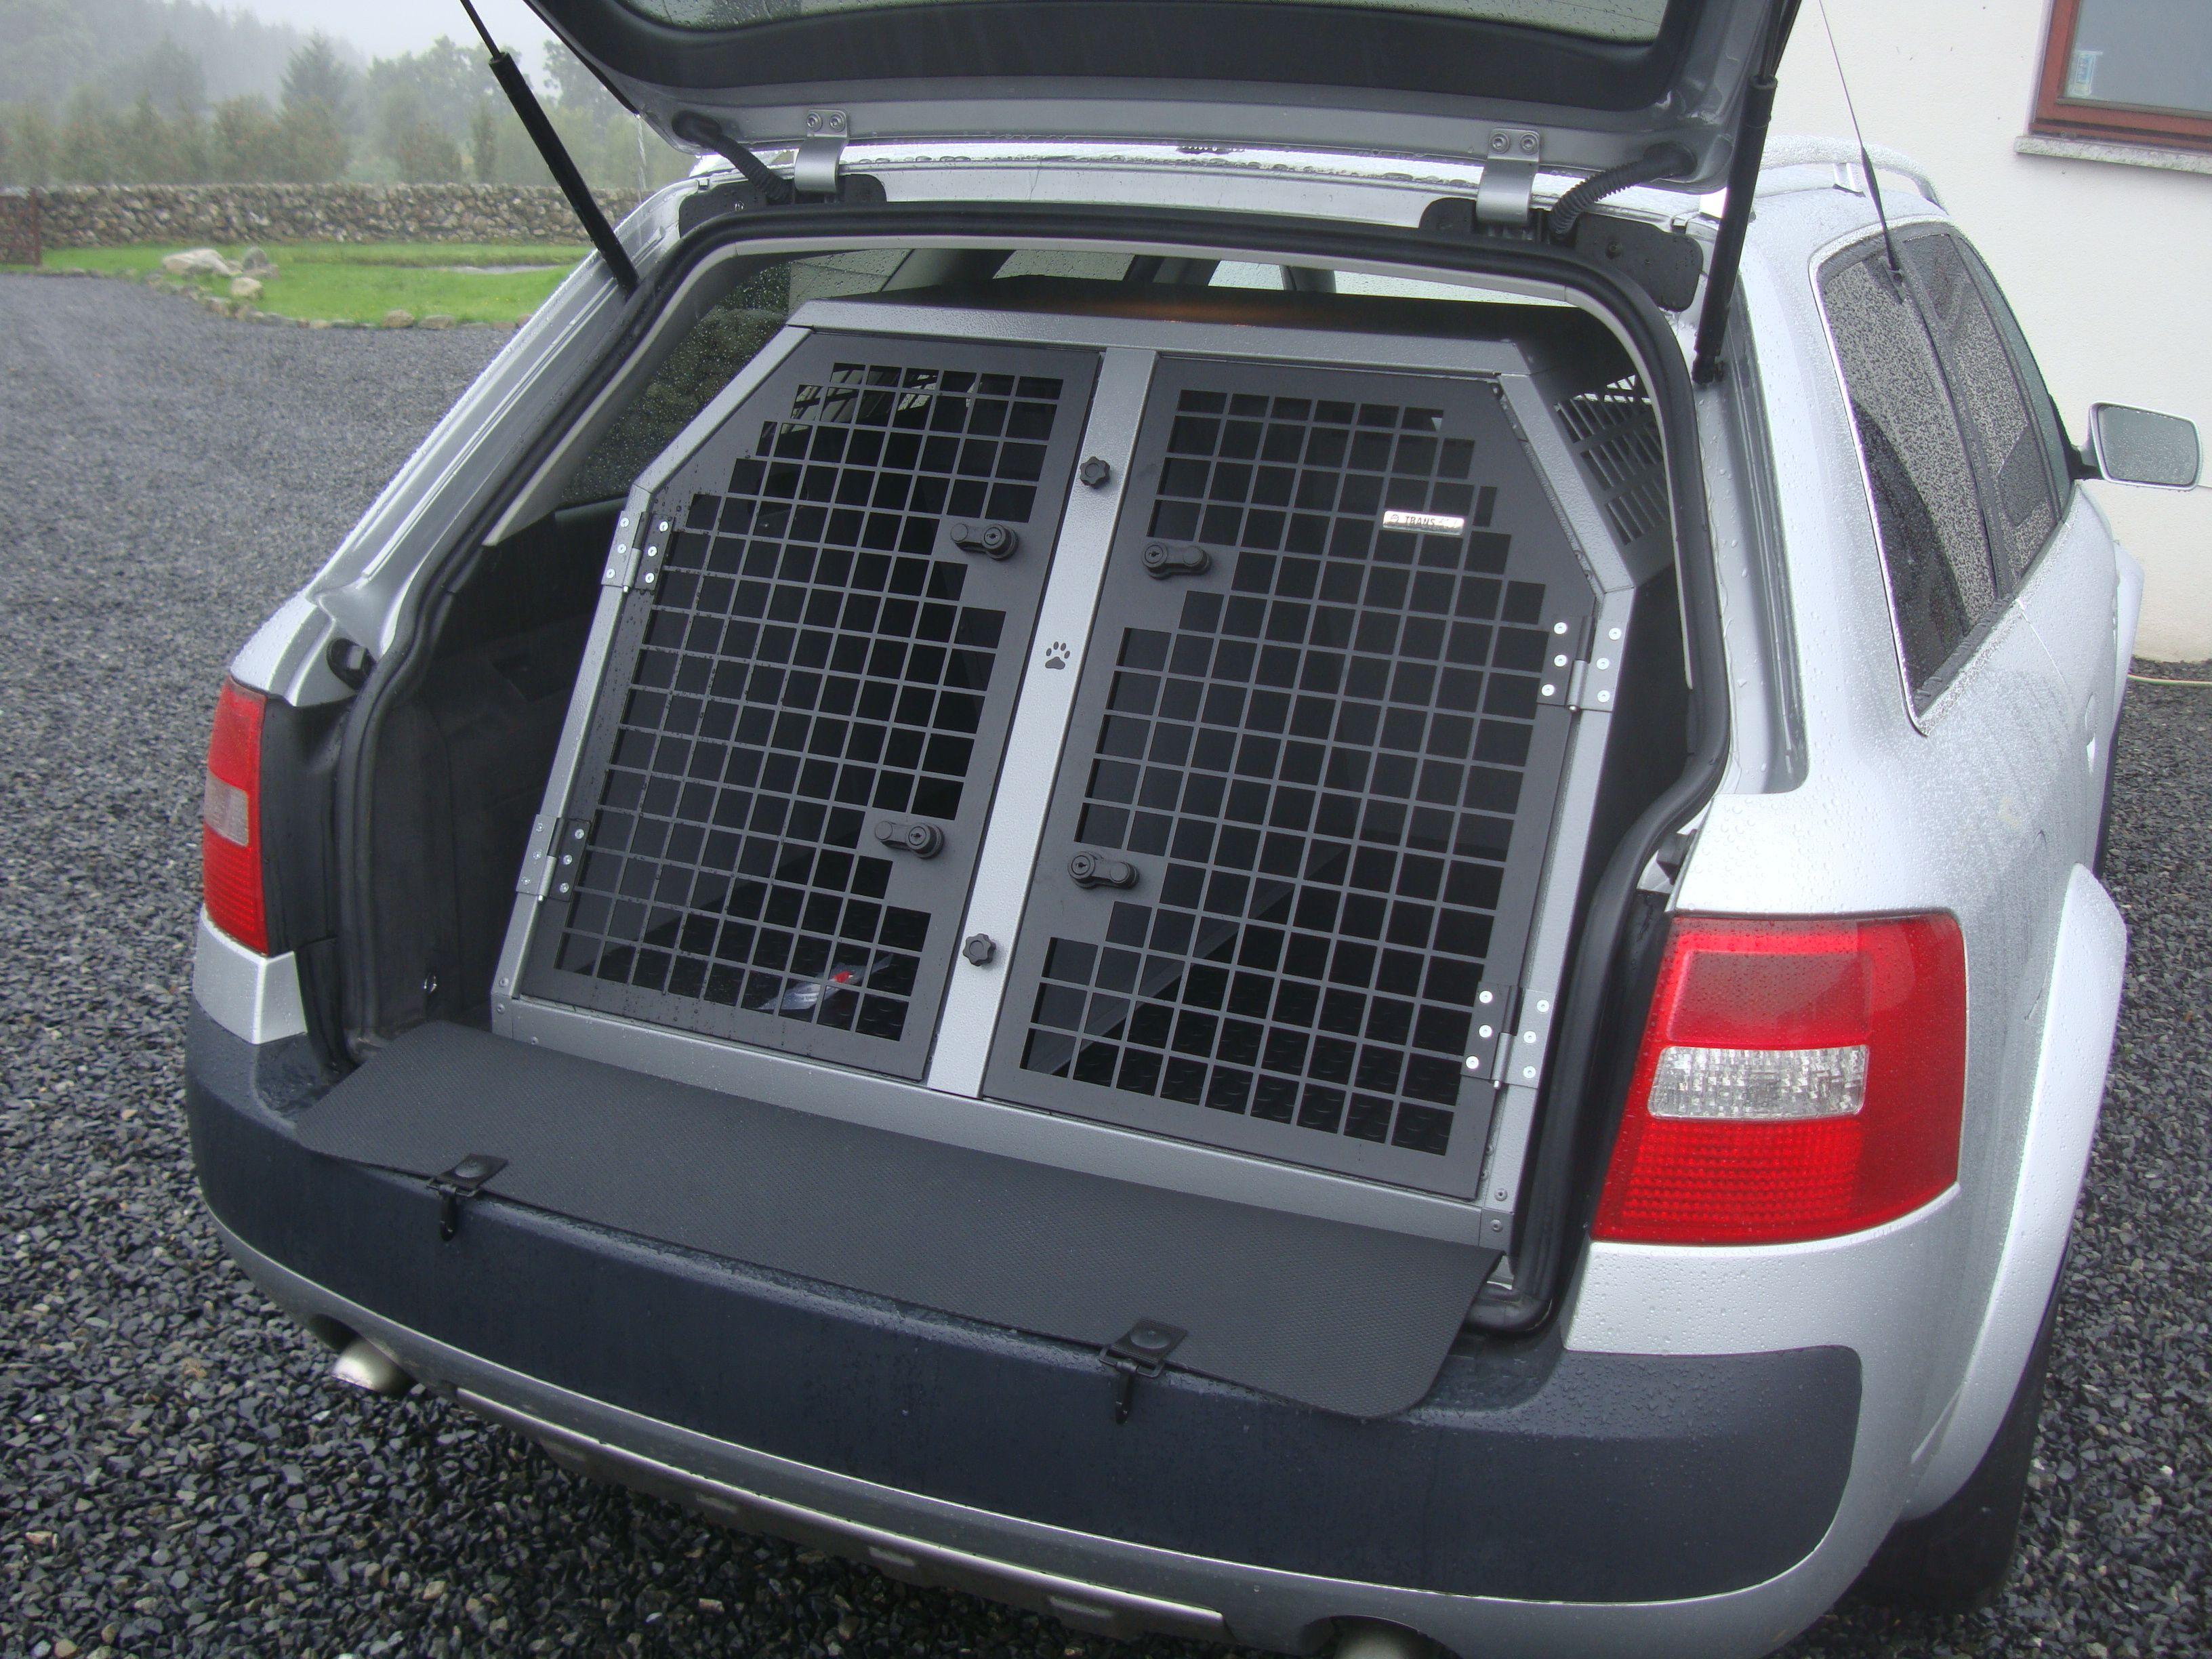 Transk9 B3 Audi A6 Avant Dog Cage Dog Crate Dog Transit